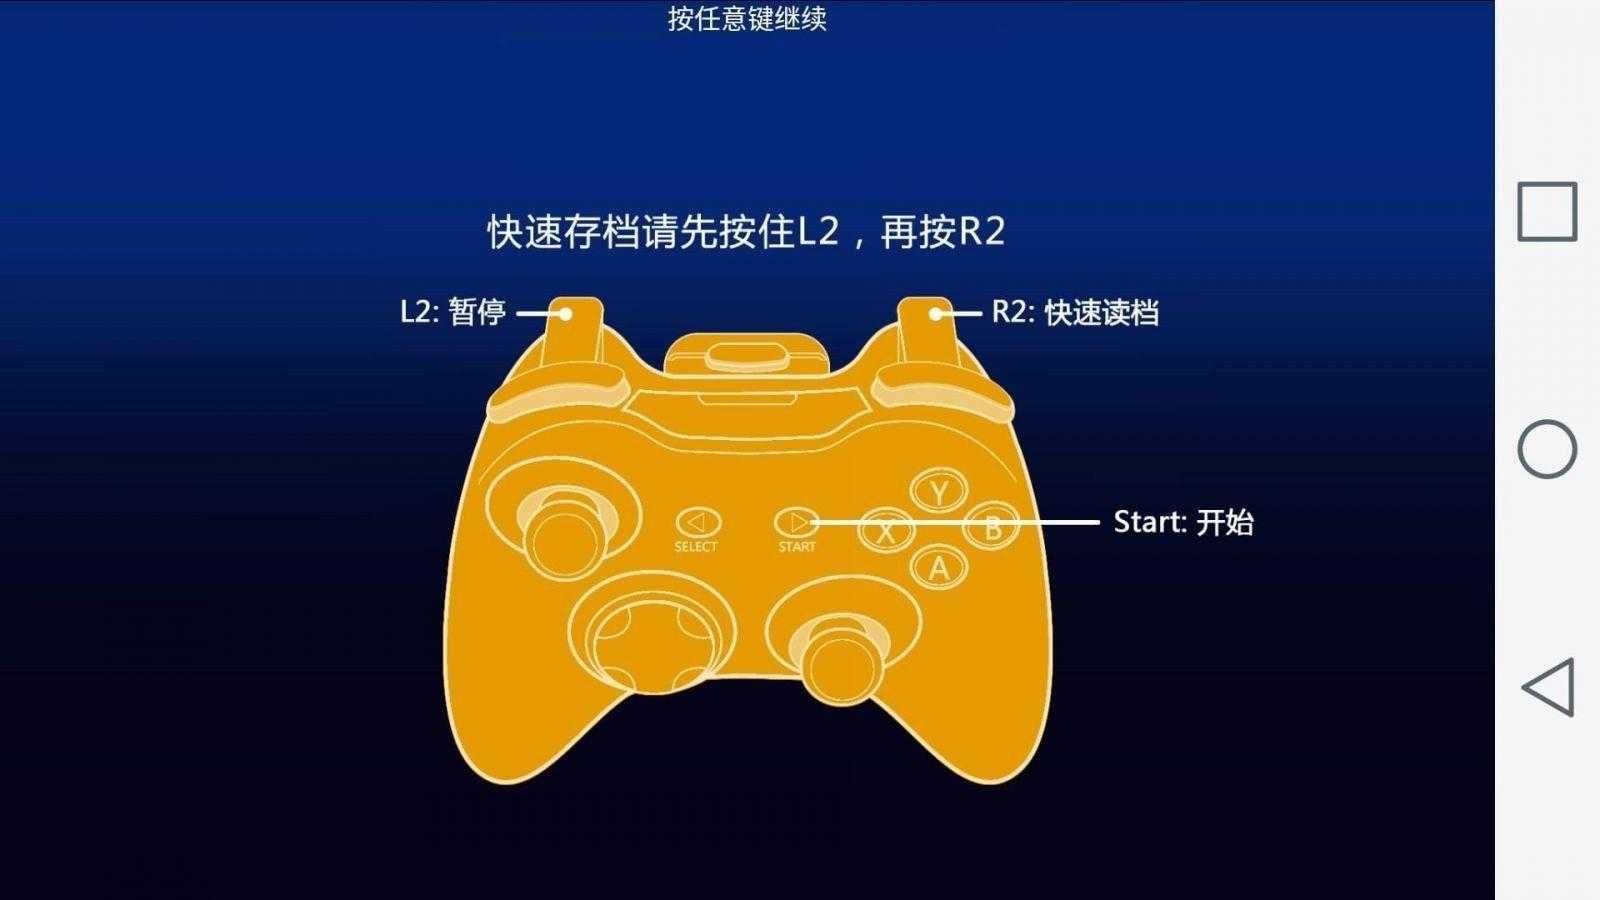 Обзор Bluetooth-геймпада iPega PG-9021 (Screenshot 2015 08 29 04 43 29)